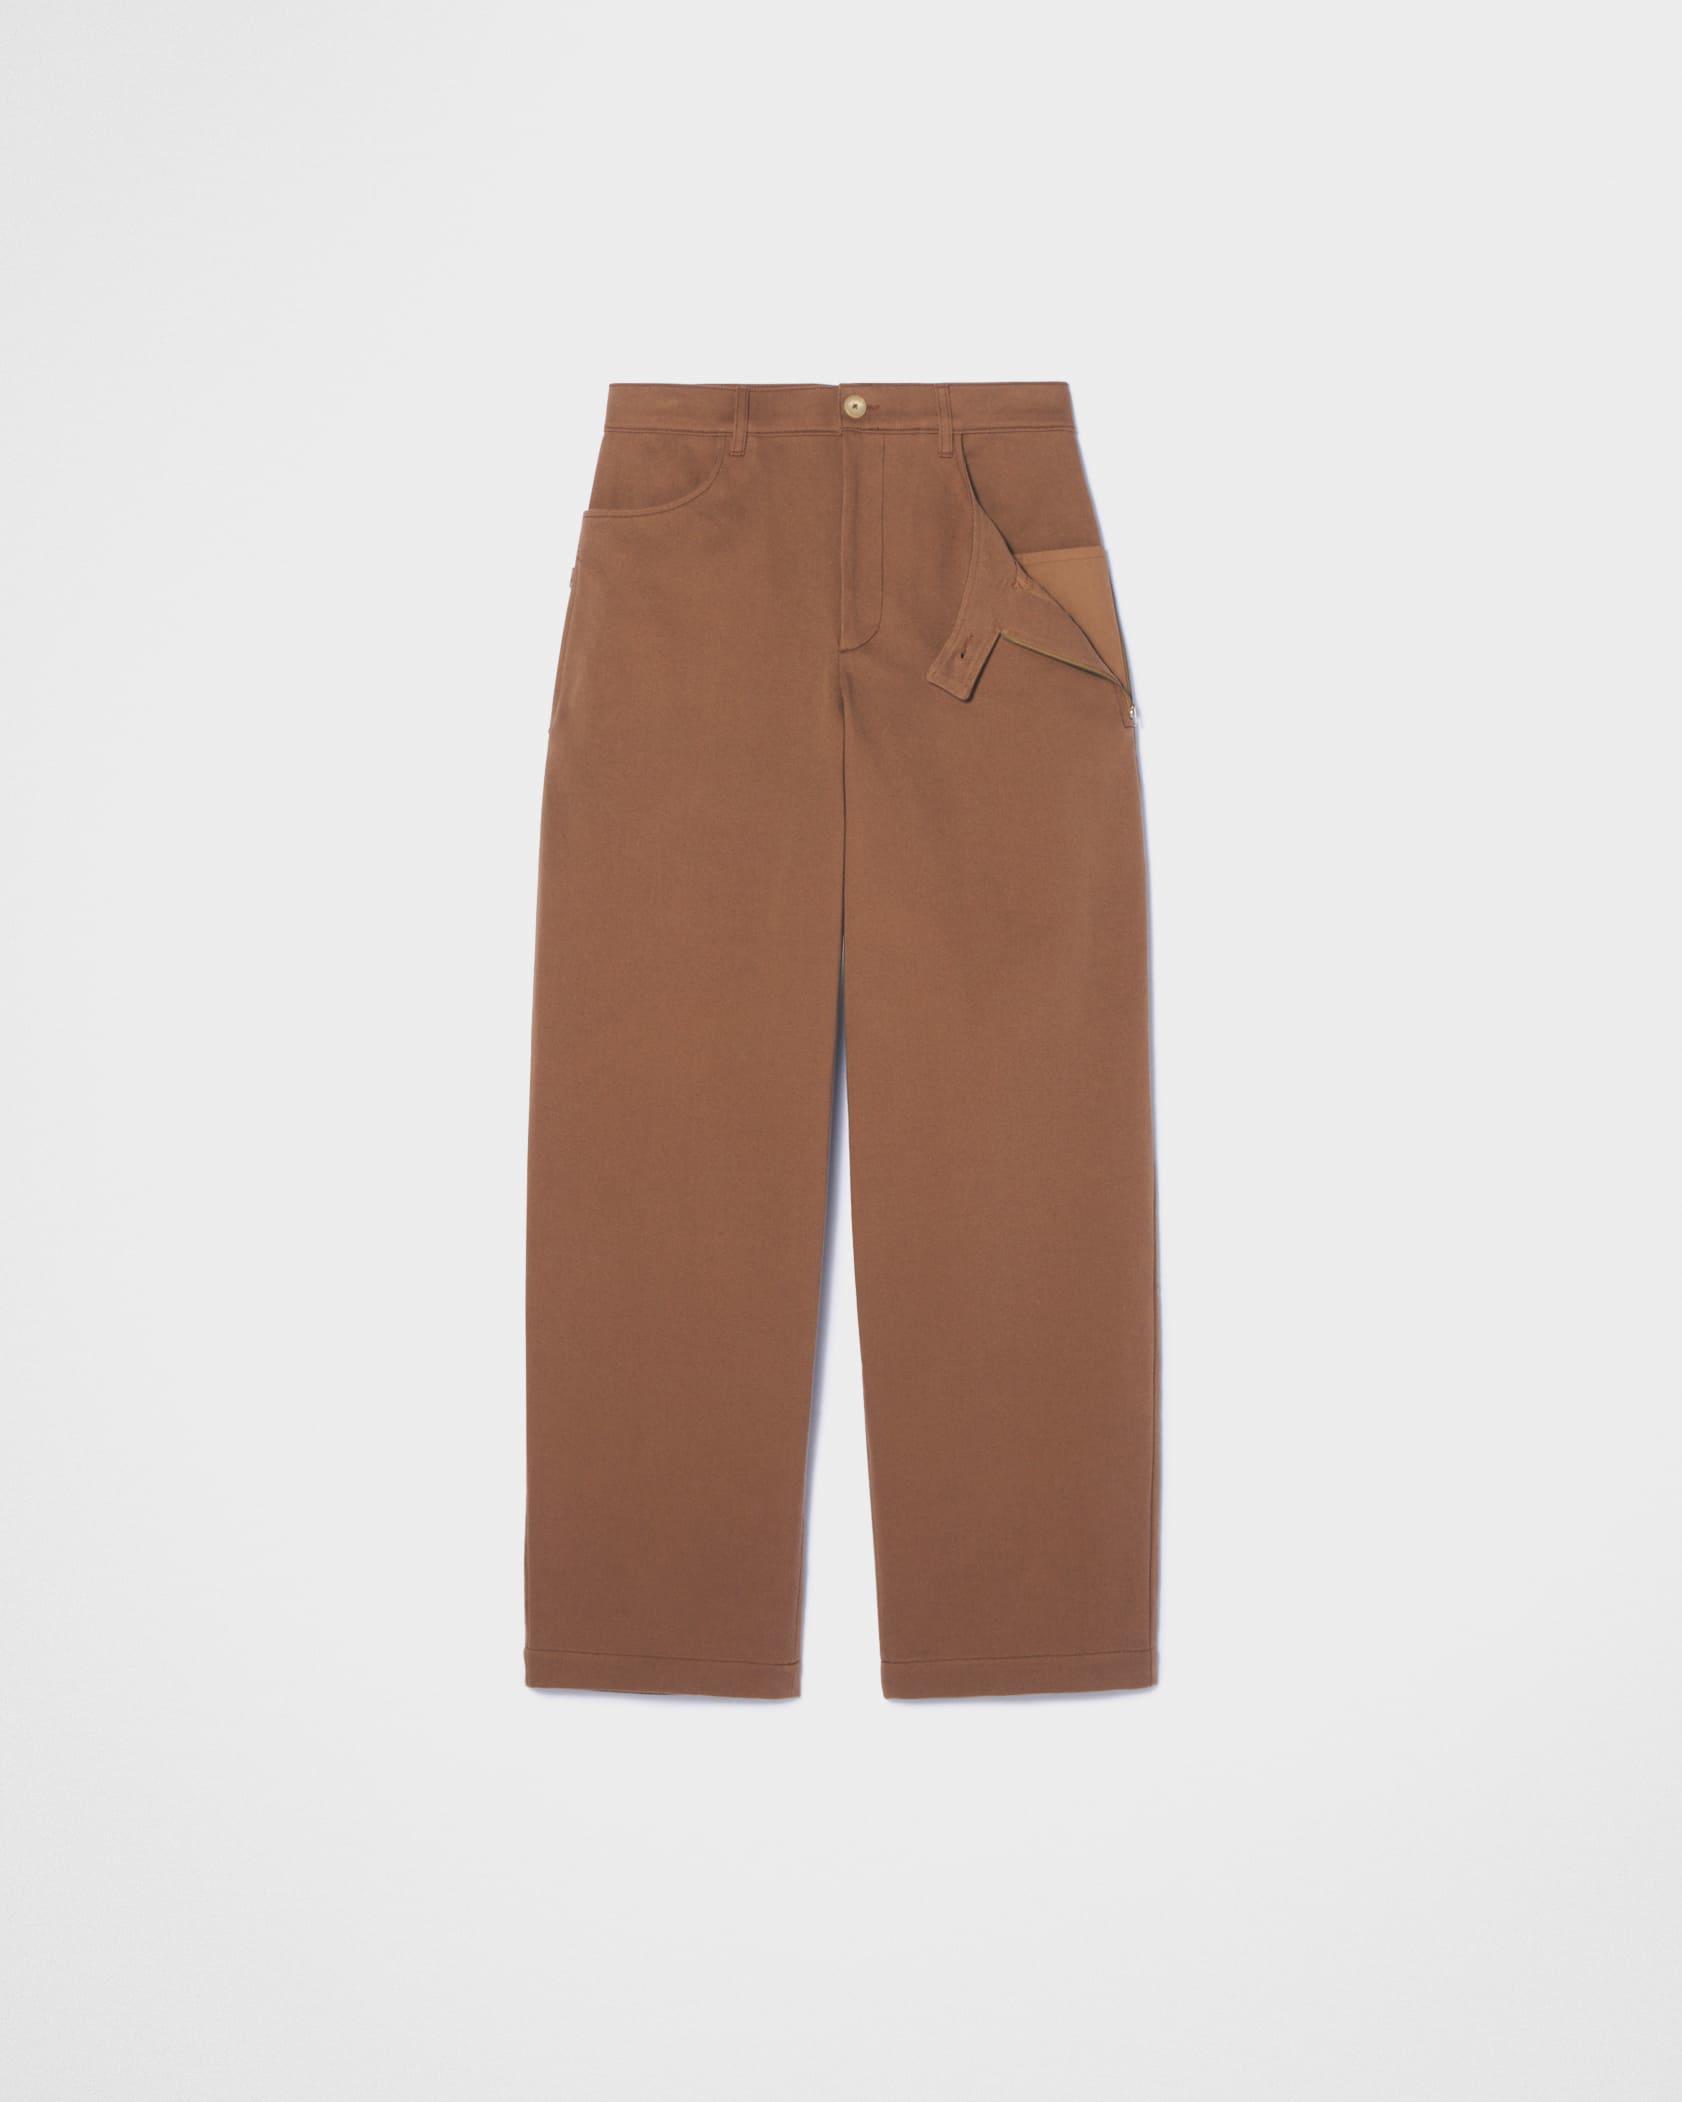 Le pantalon Picchu